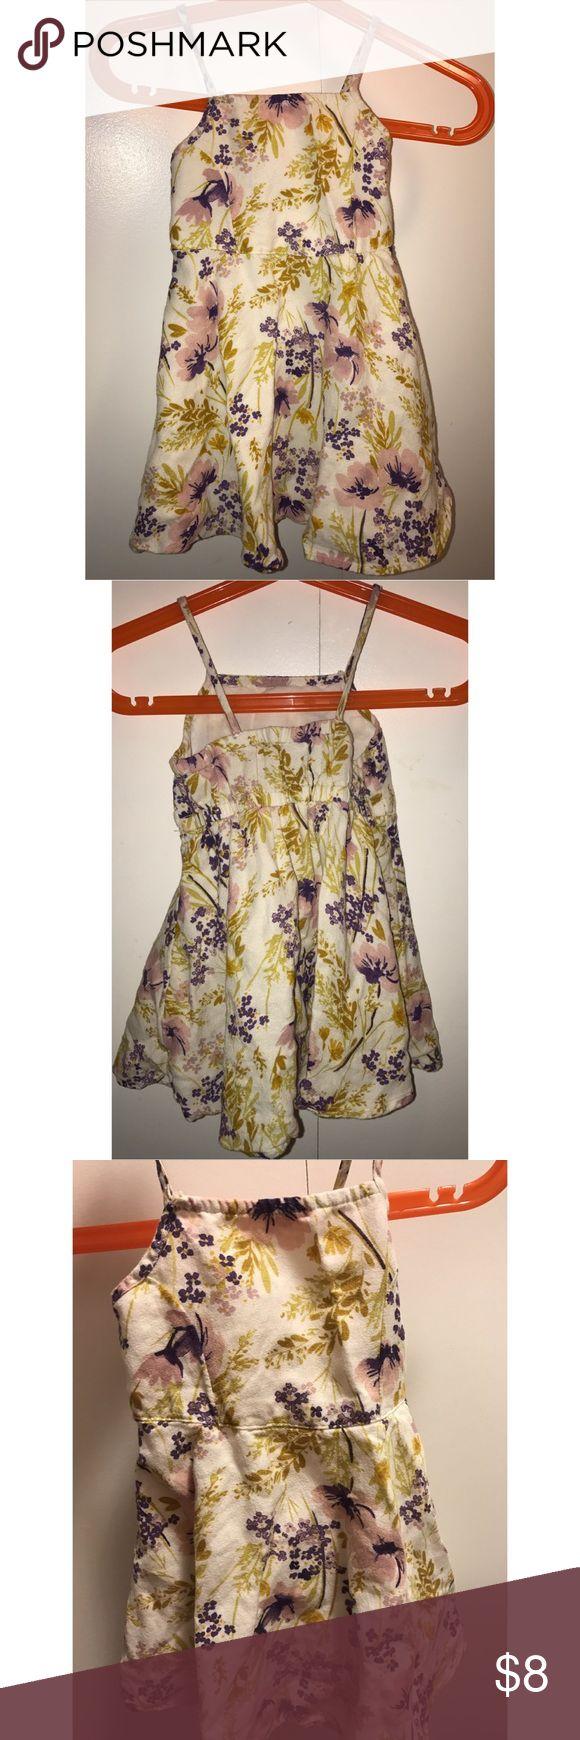 12-18 Months Old Navy Dress Mustard floral summer dress Old Navy Dresses Casual